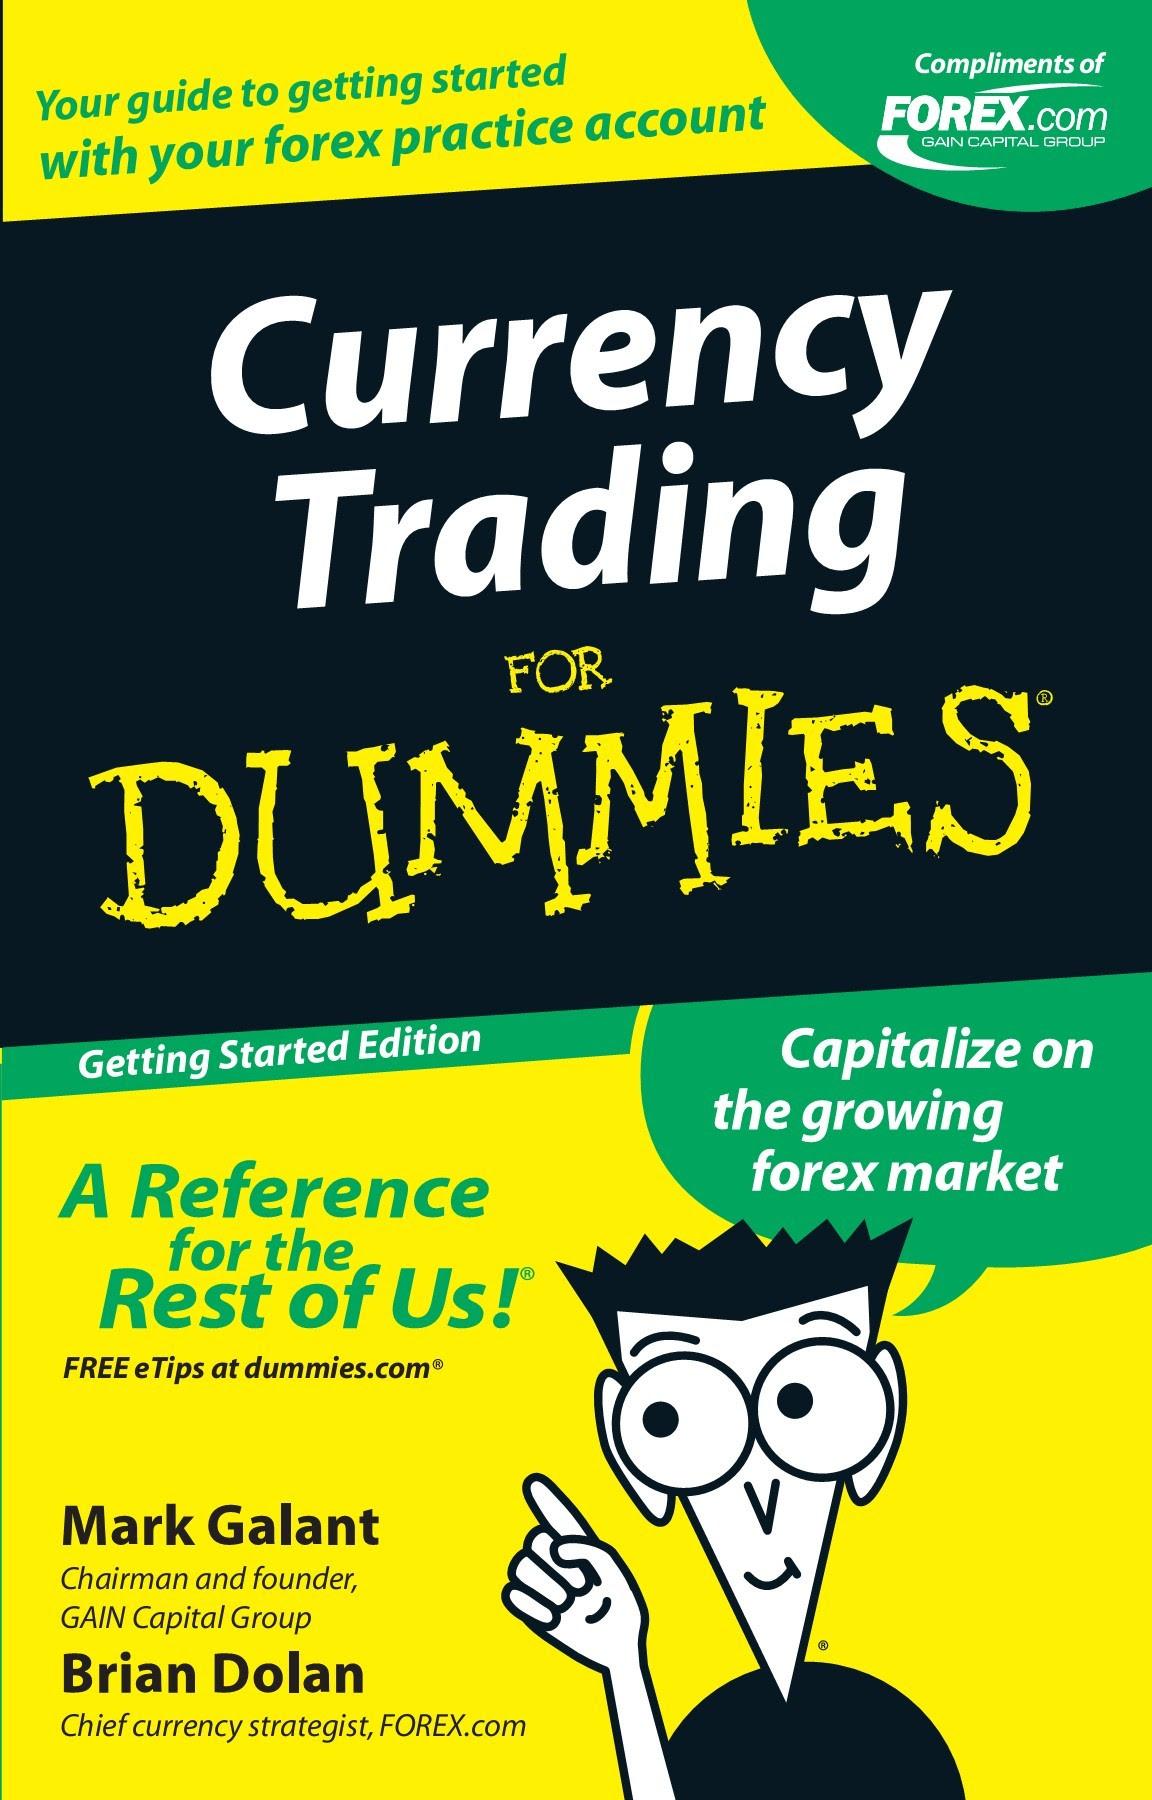 Capital spread betting demo account villanova vs syracuse betting line